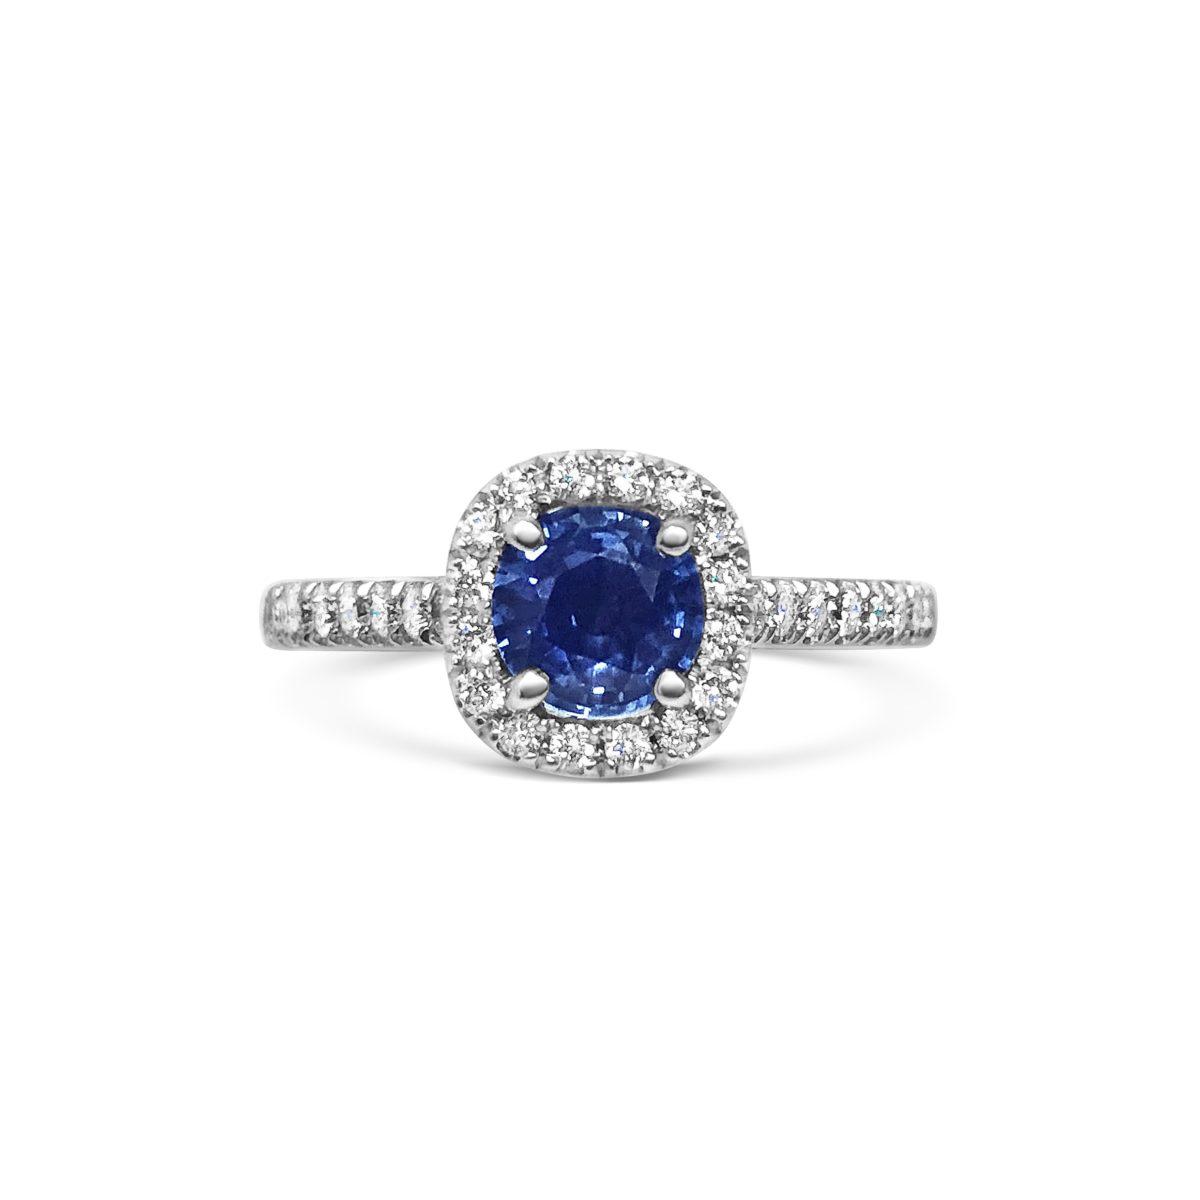 Heidi Cushion Cut Blue Sapphire Halo Microset Engagement Ring Front View